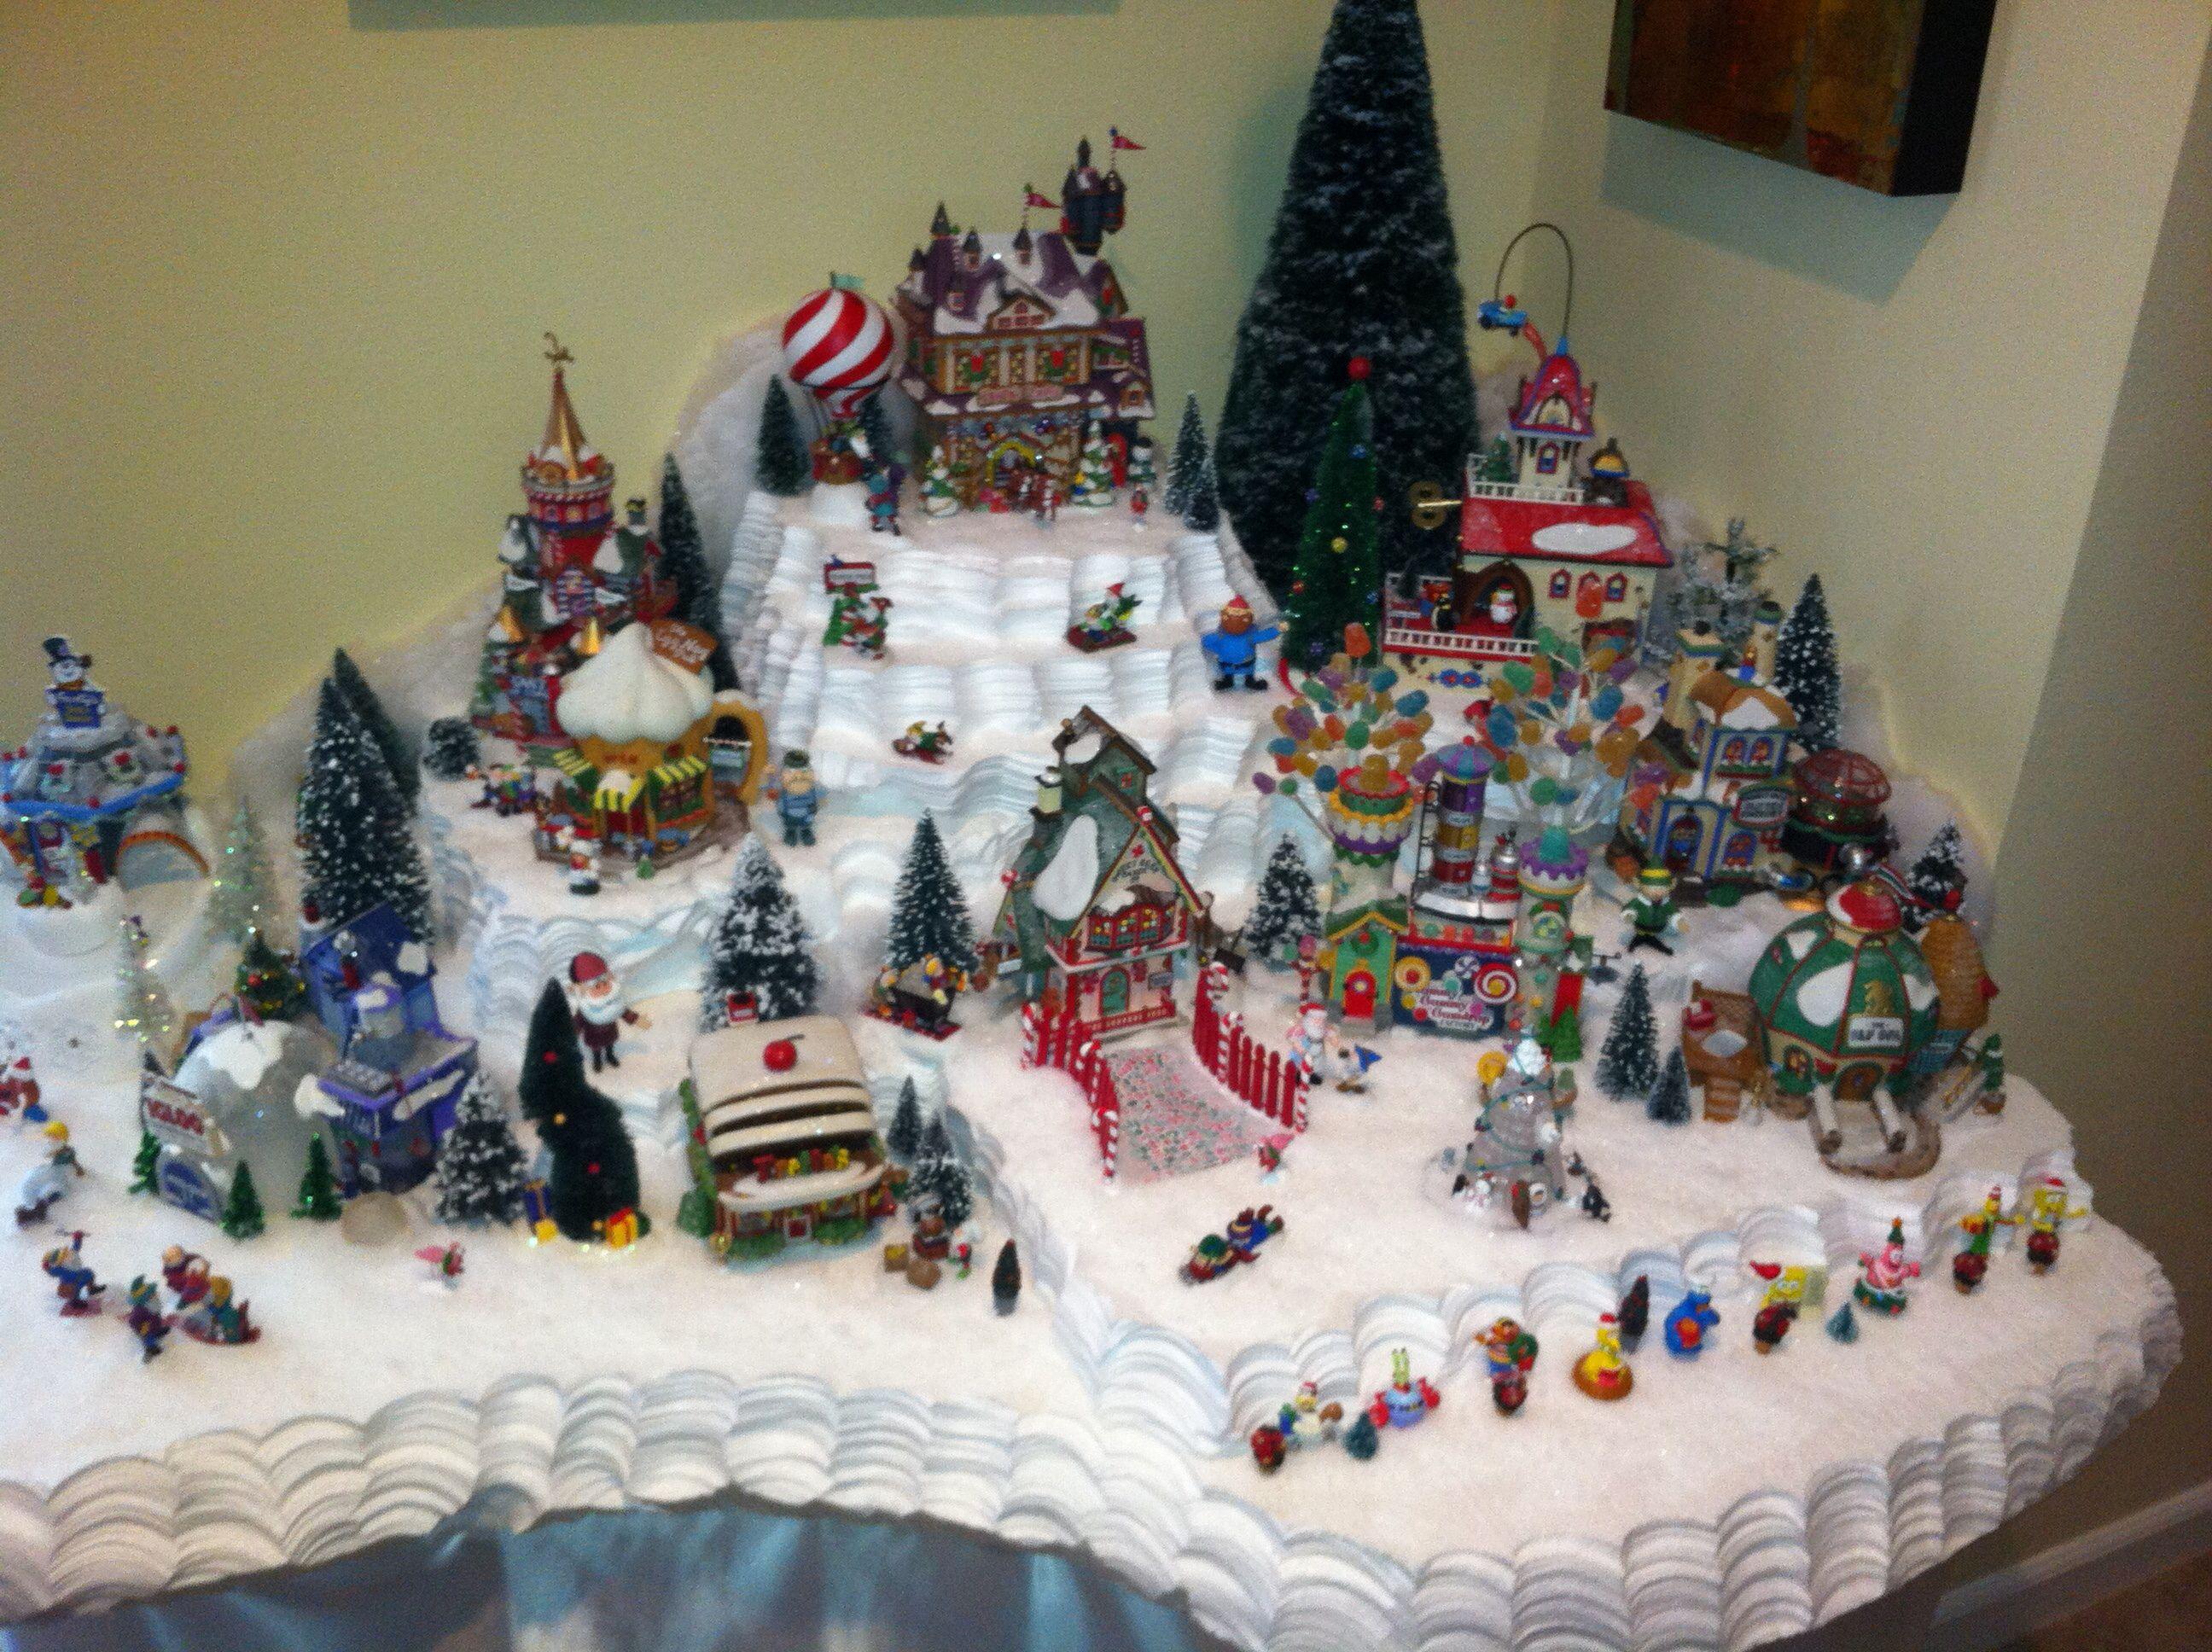 North Pole villas navide±as Pinterest